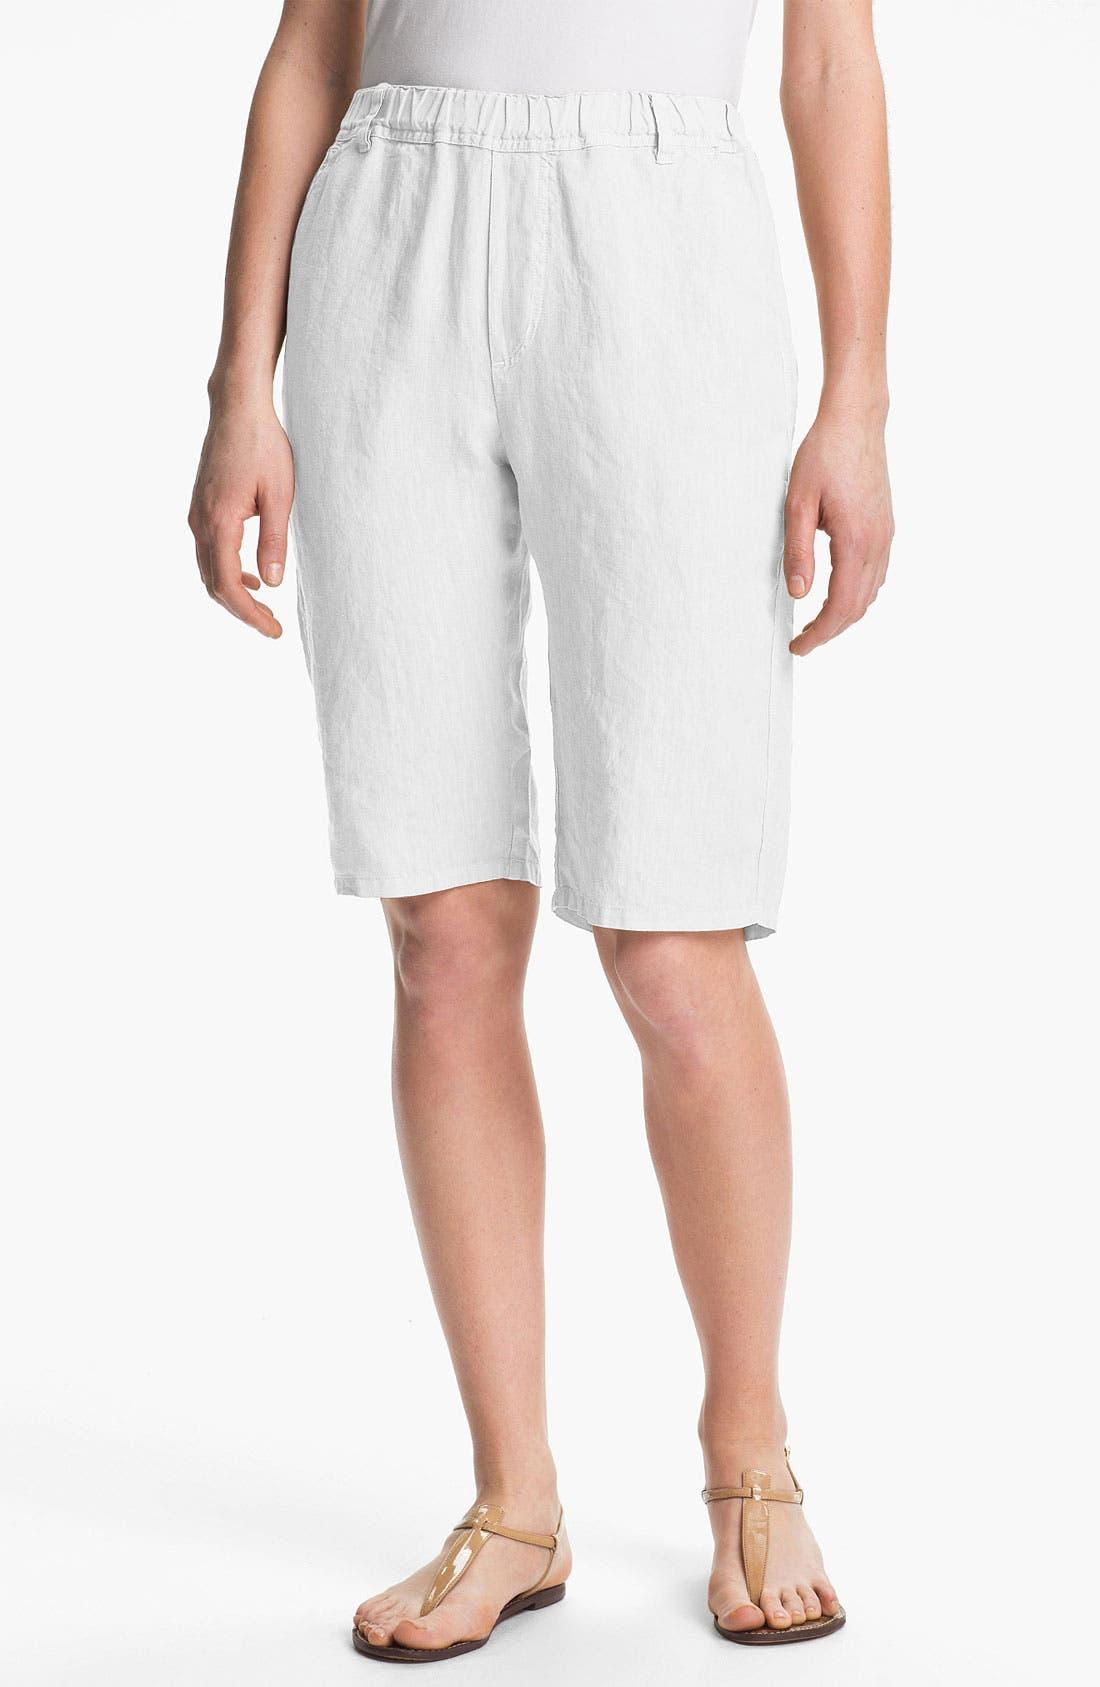 Alternate Image 1 Selected - Nicki & Bell Linen Bermuda Shorts